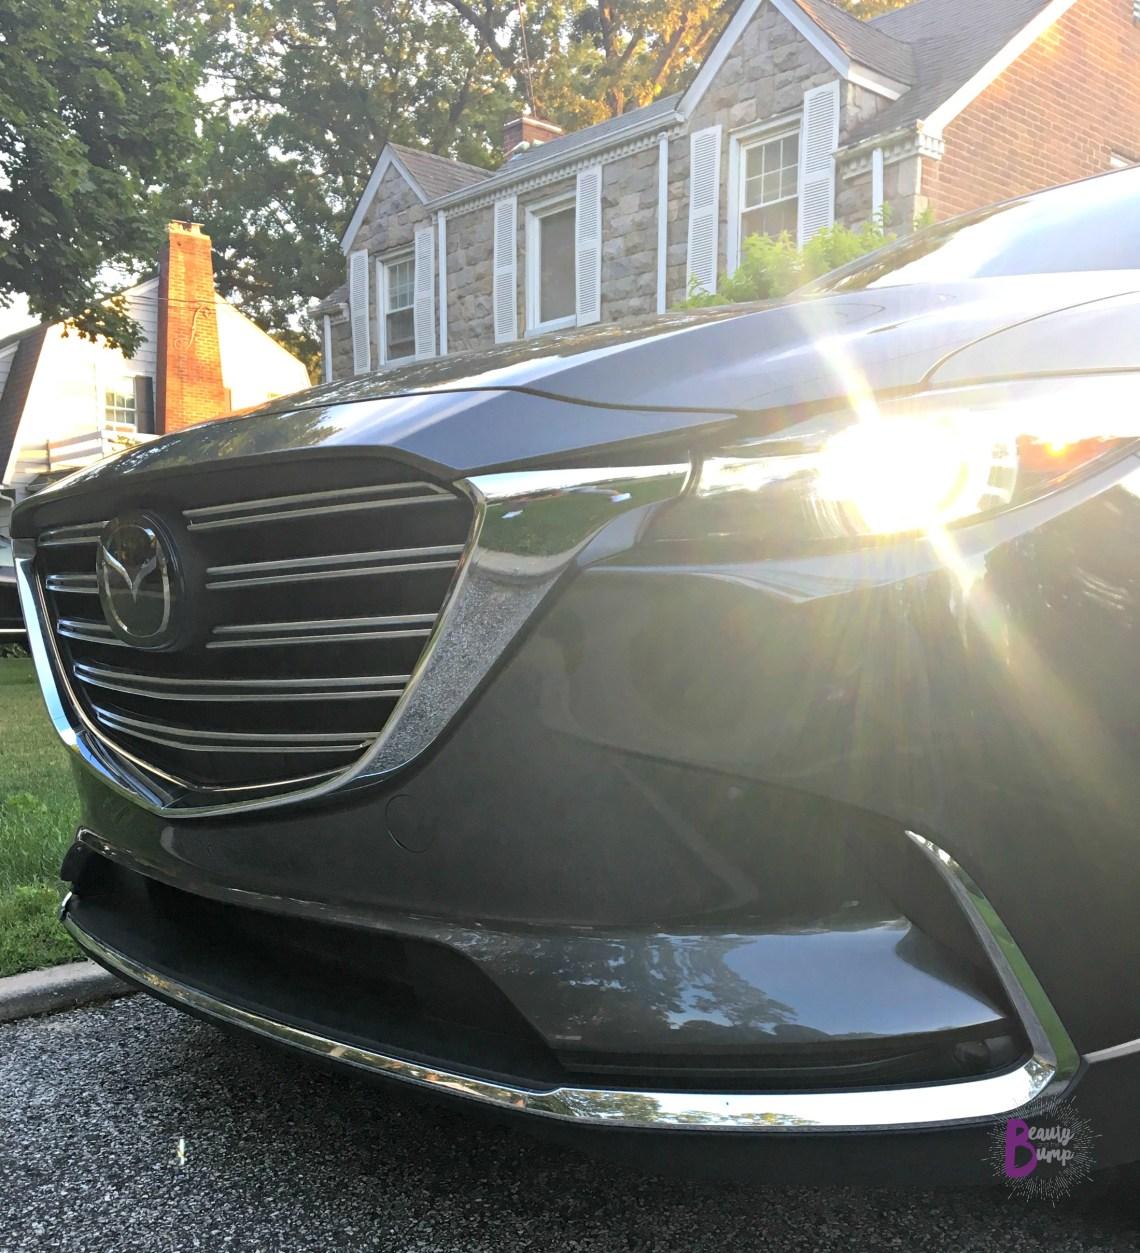 Mazda mazda cx 9 front grill : The 2017 Mazda CX-9 Signature AWD is NOT Your Average 'Mom Car'